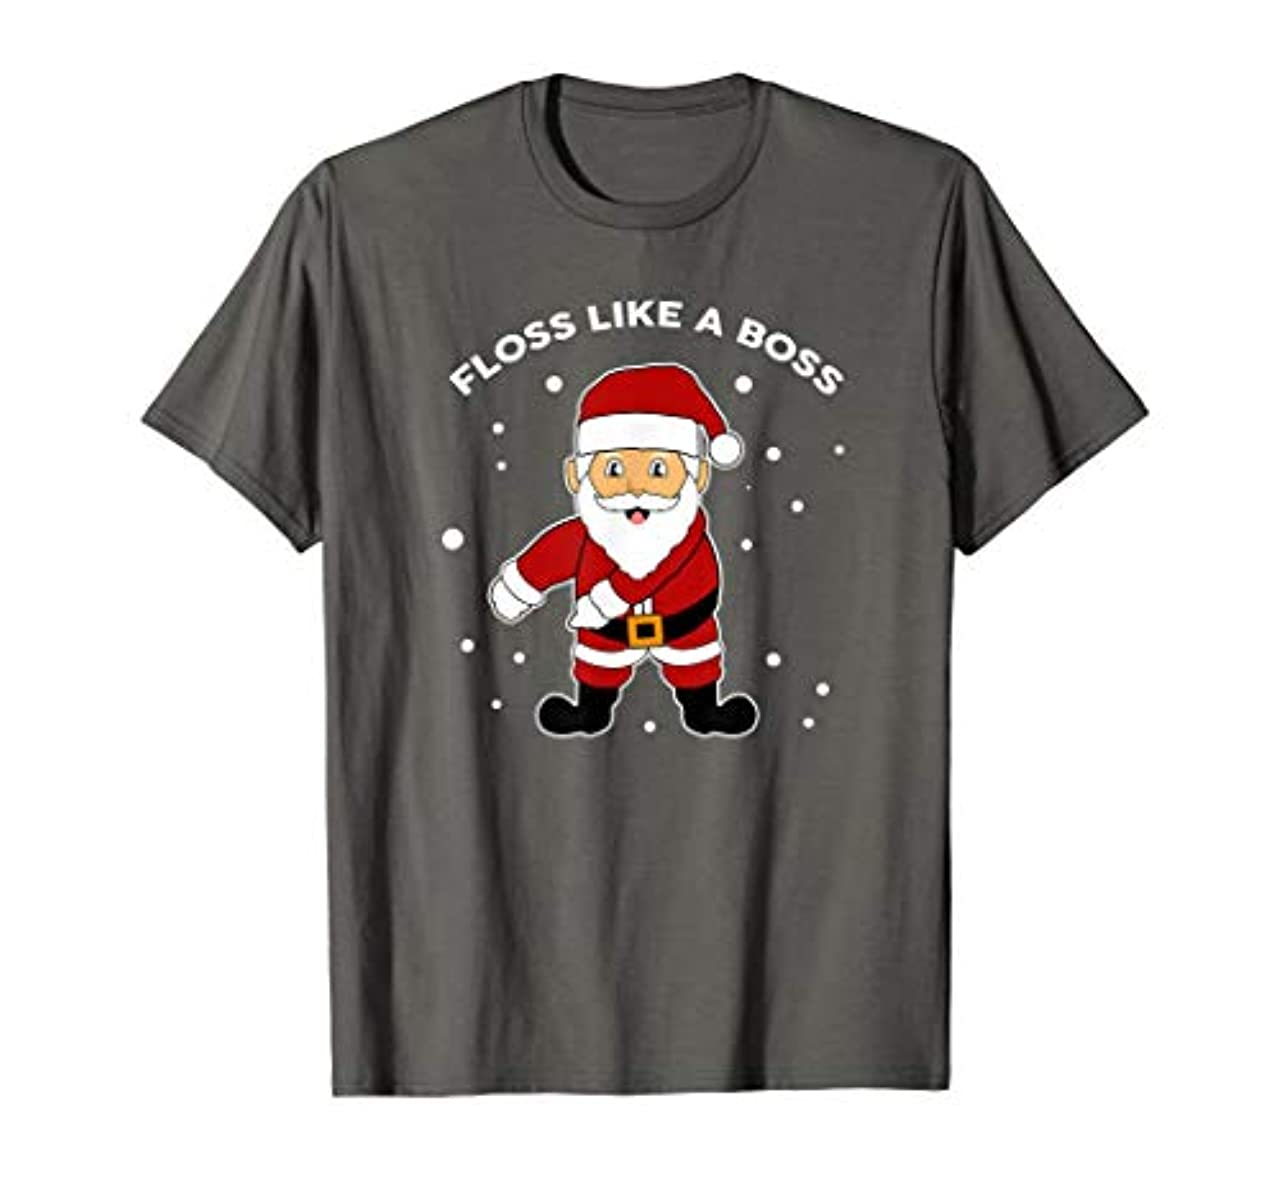 Floss Like A Boss Shirt | Xmas Santa Lovers T-Shirt Gift